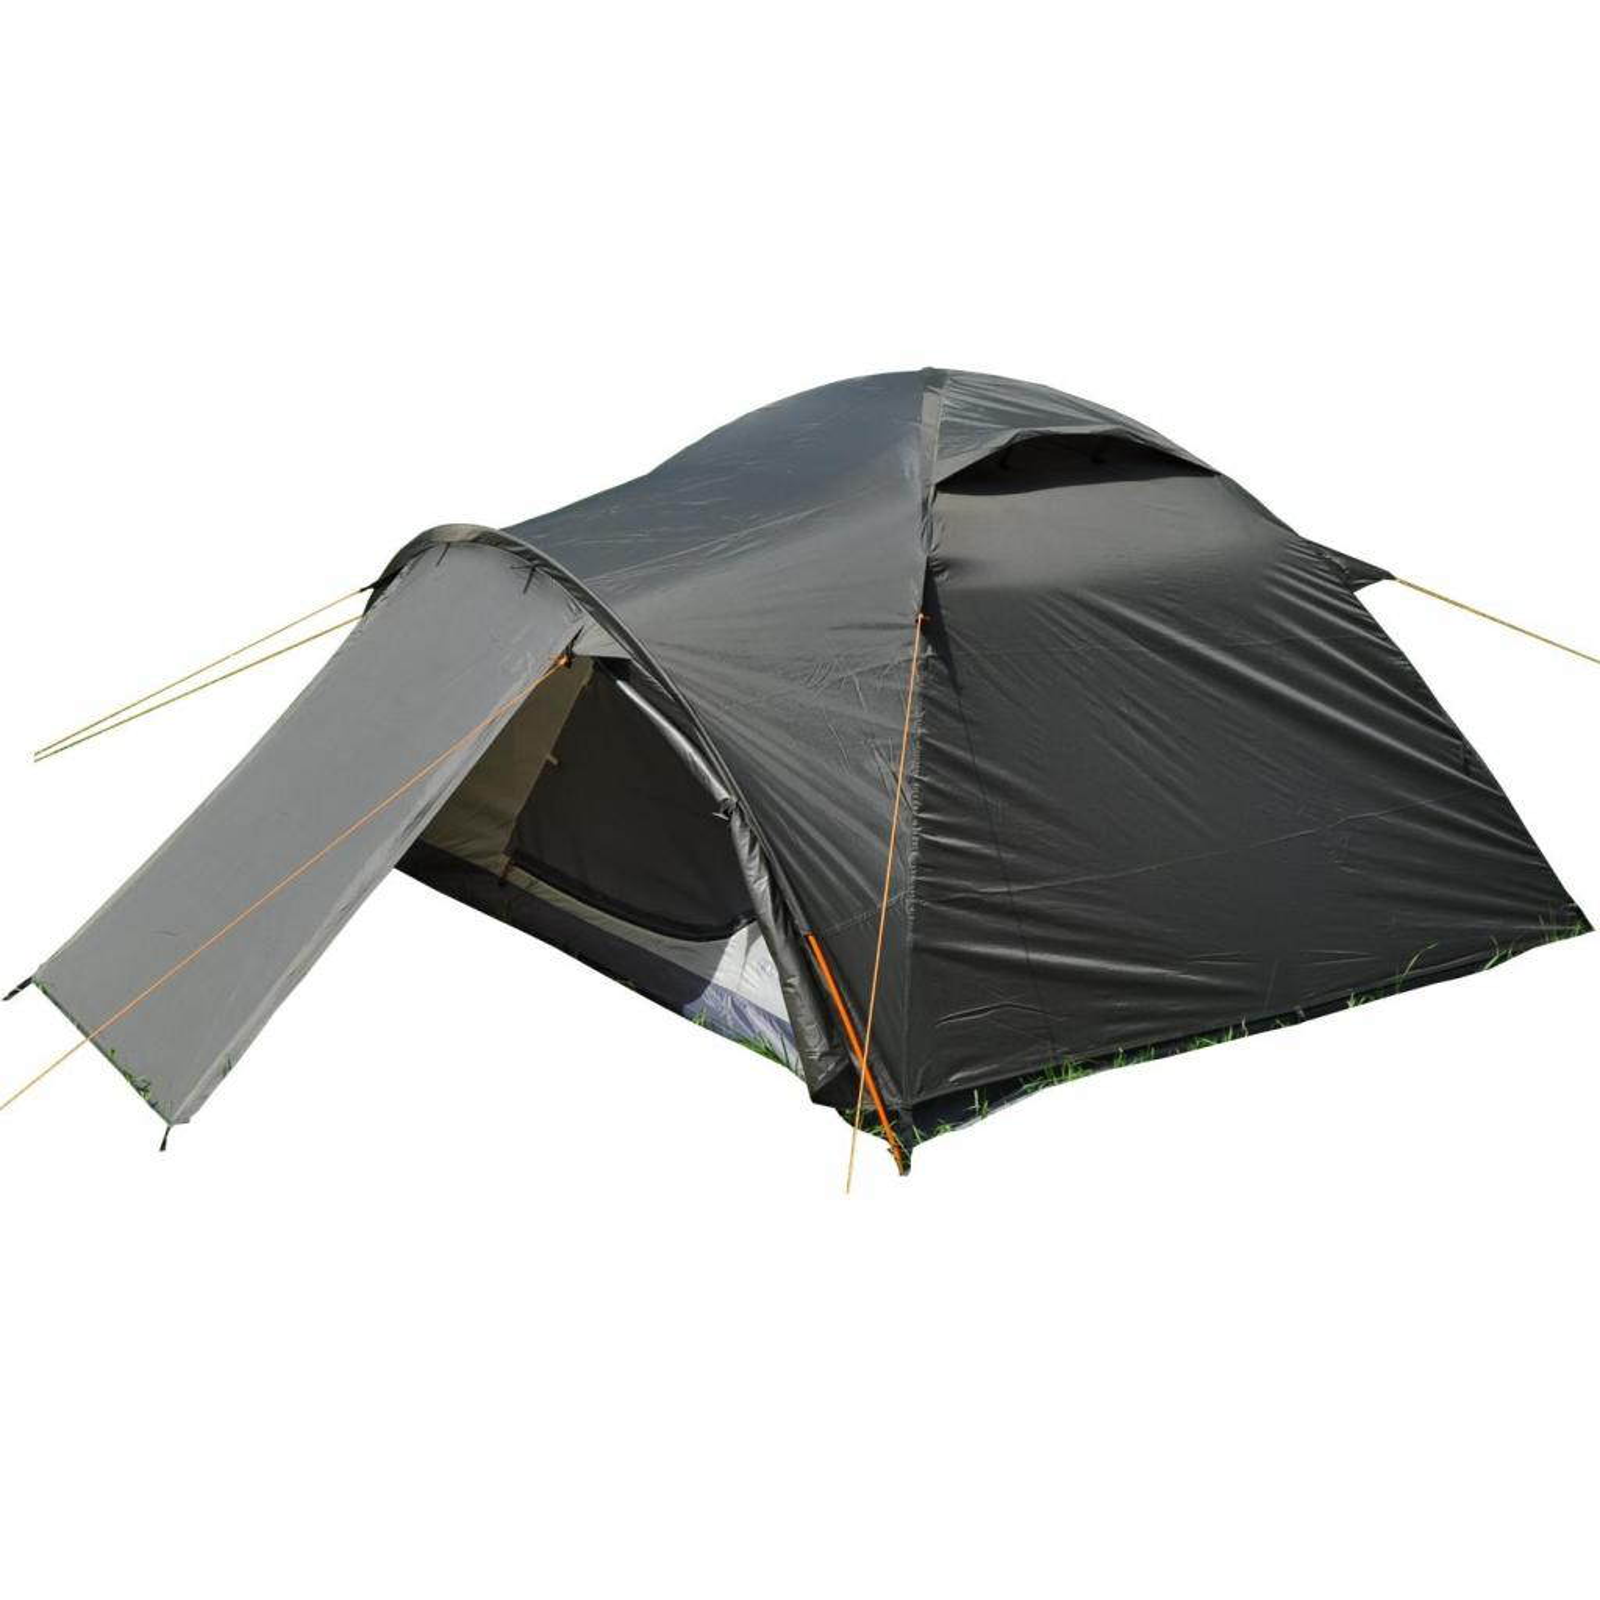 Палатка Mousson ATLANT 4 AL KHAKI (7884) изображение 2